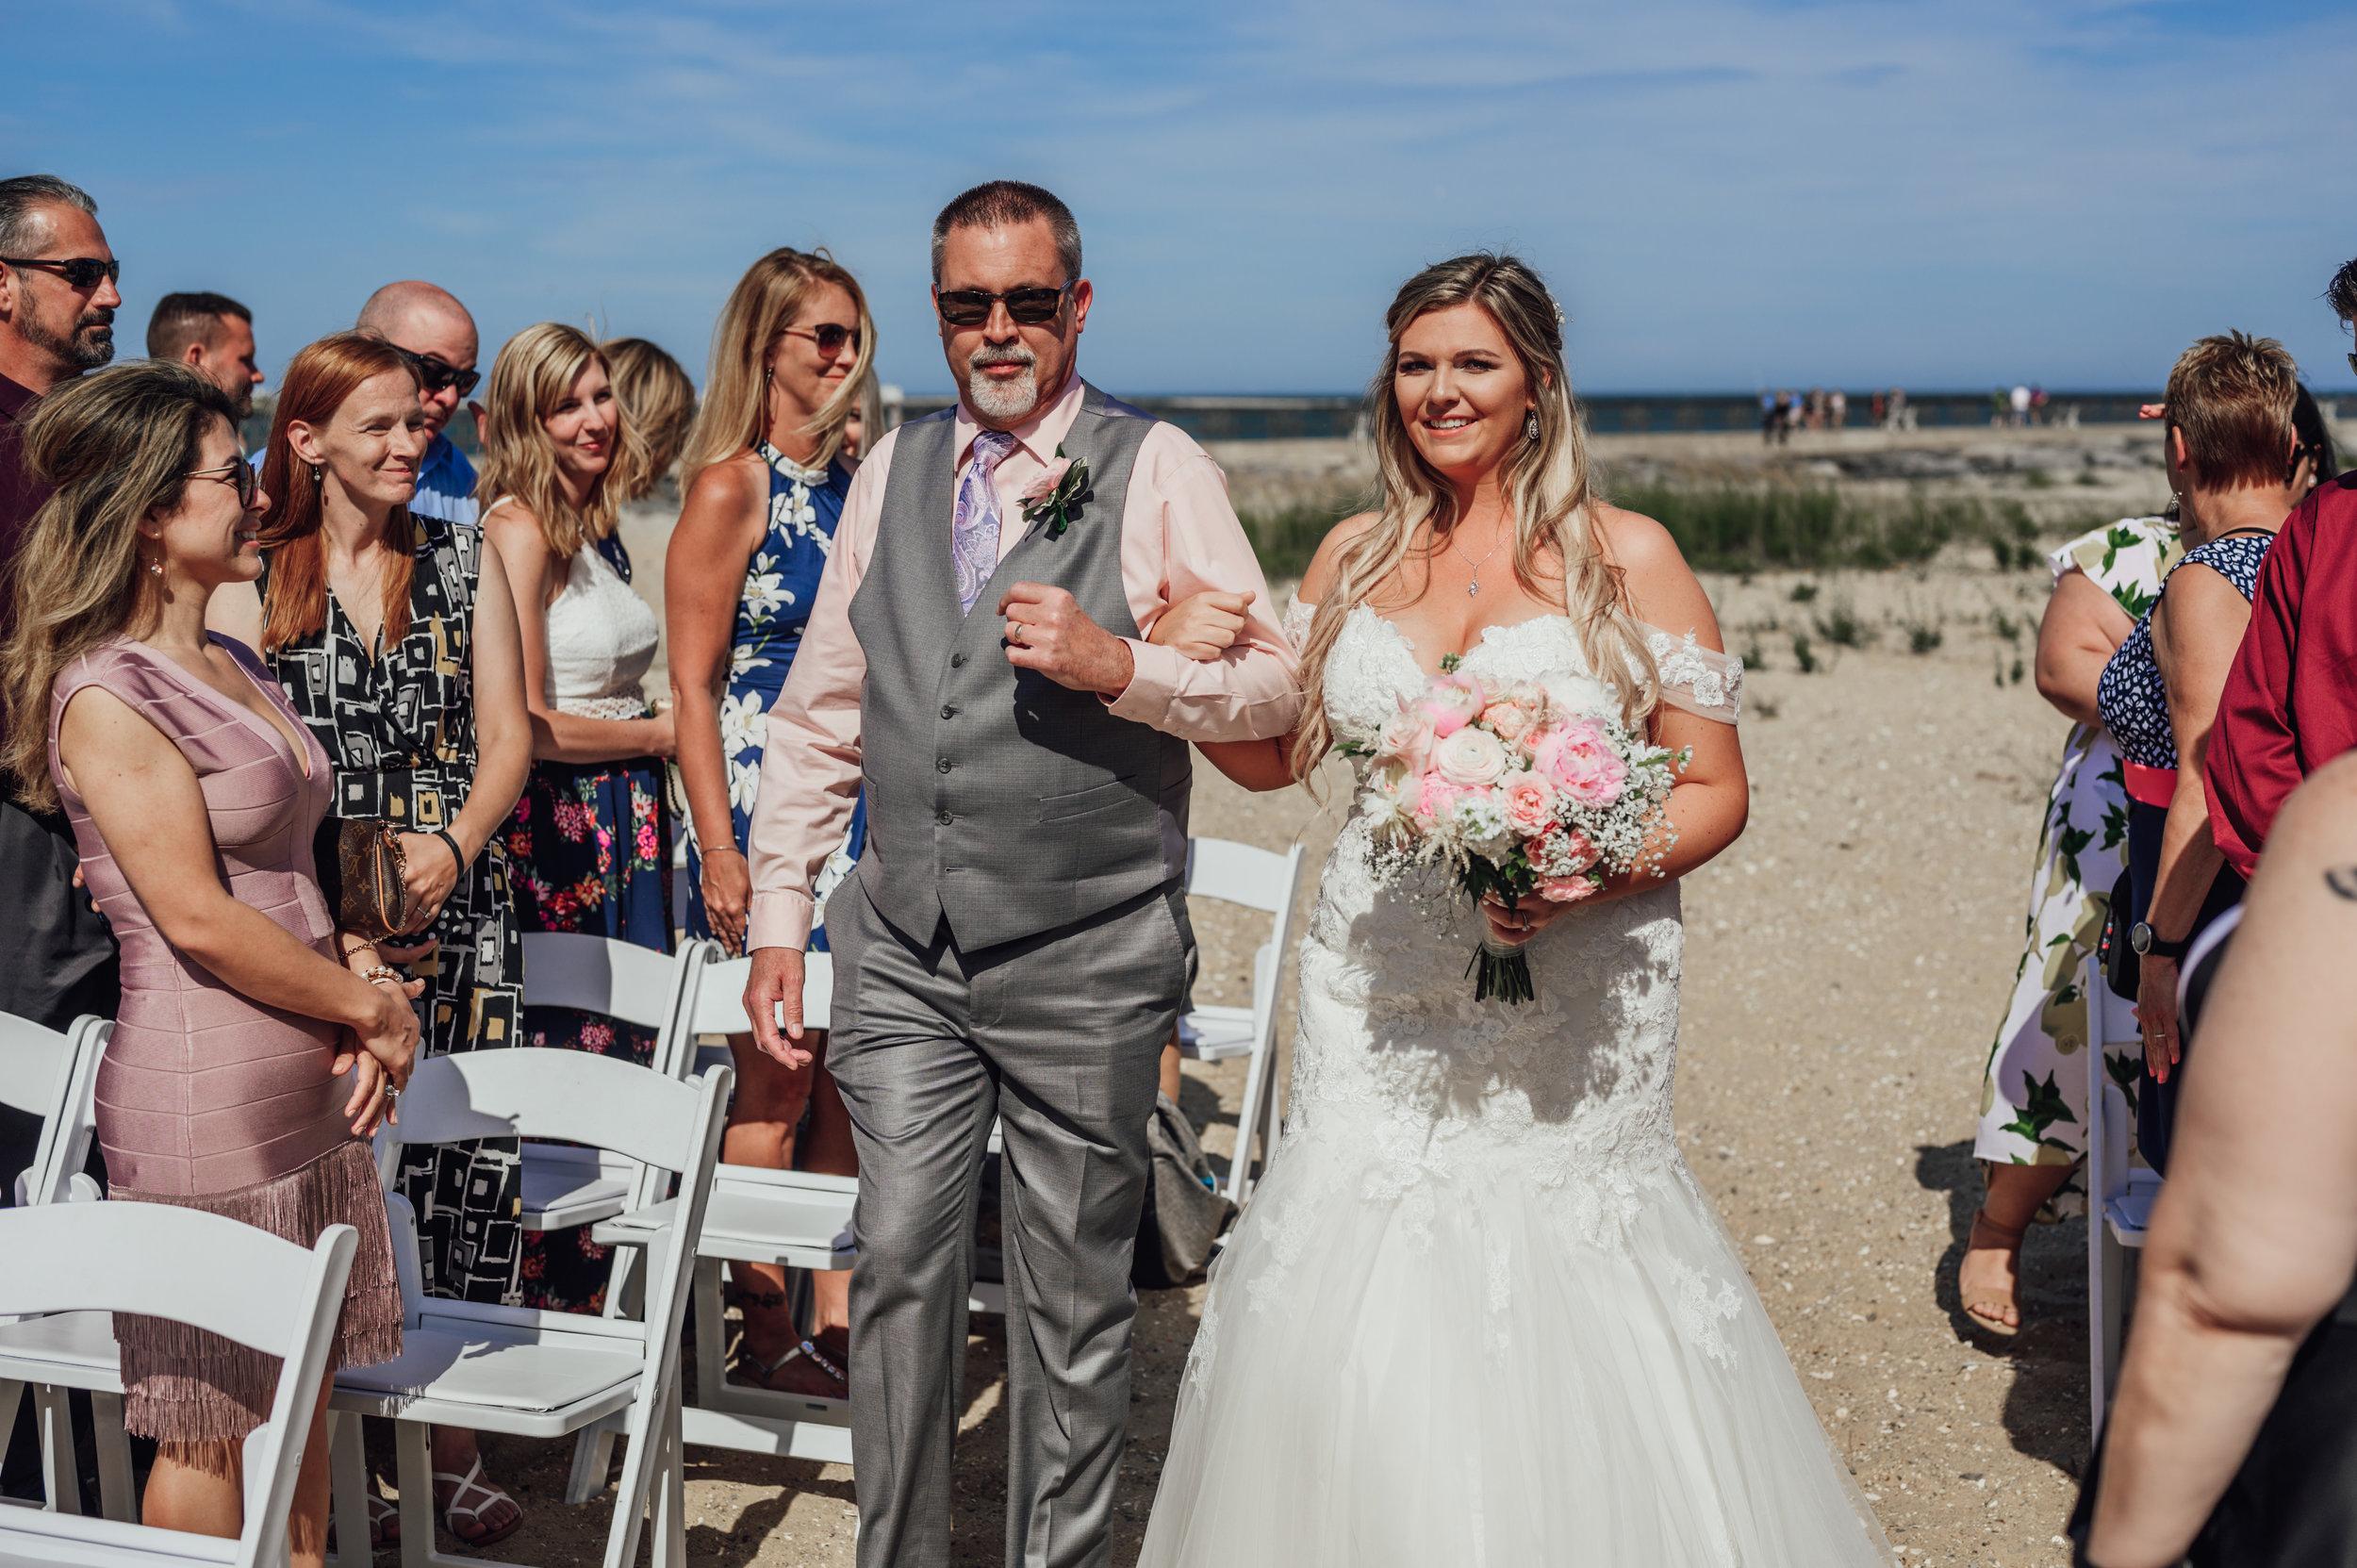 New Jersey Wedding Photographer, Felsberg Photography LBI wedding photography 63.jpg